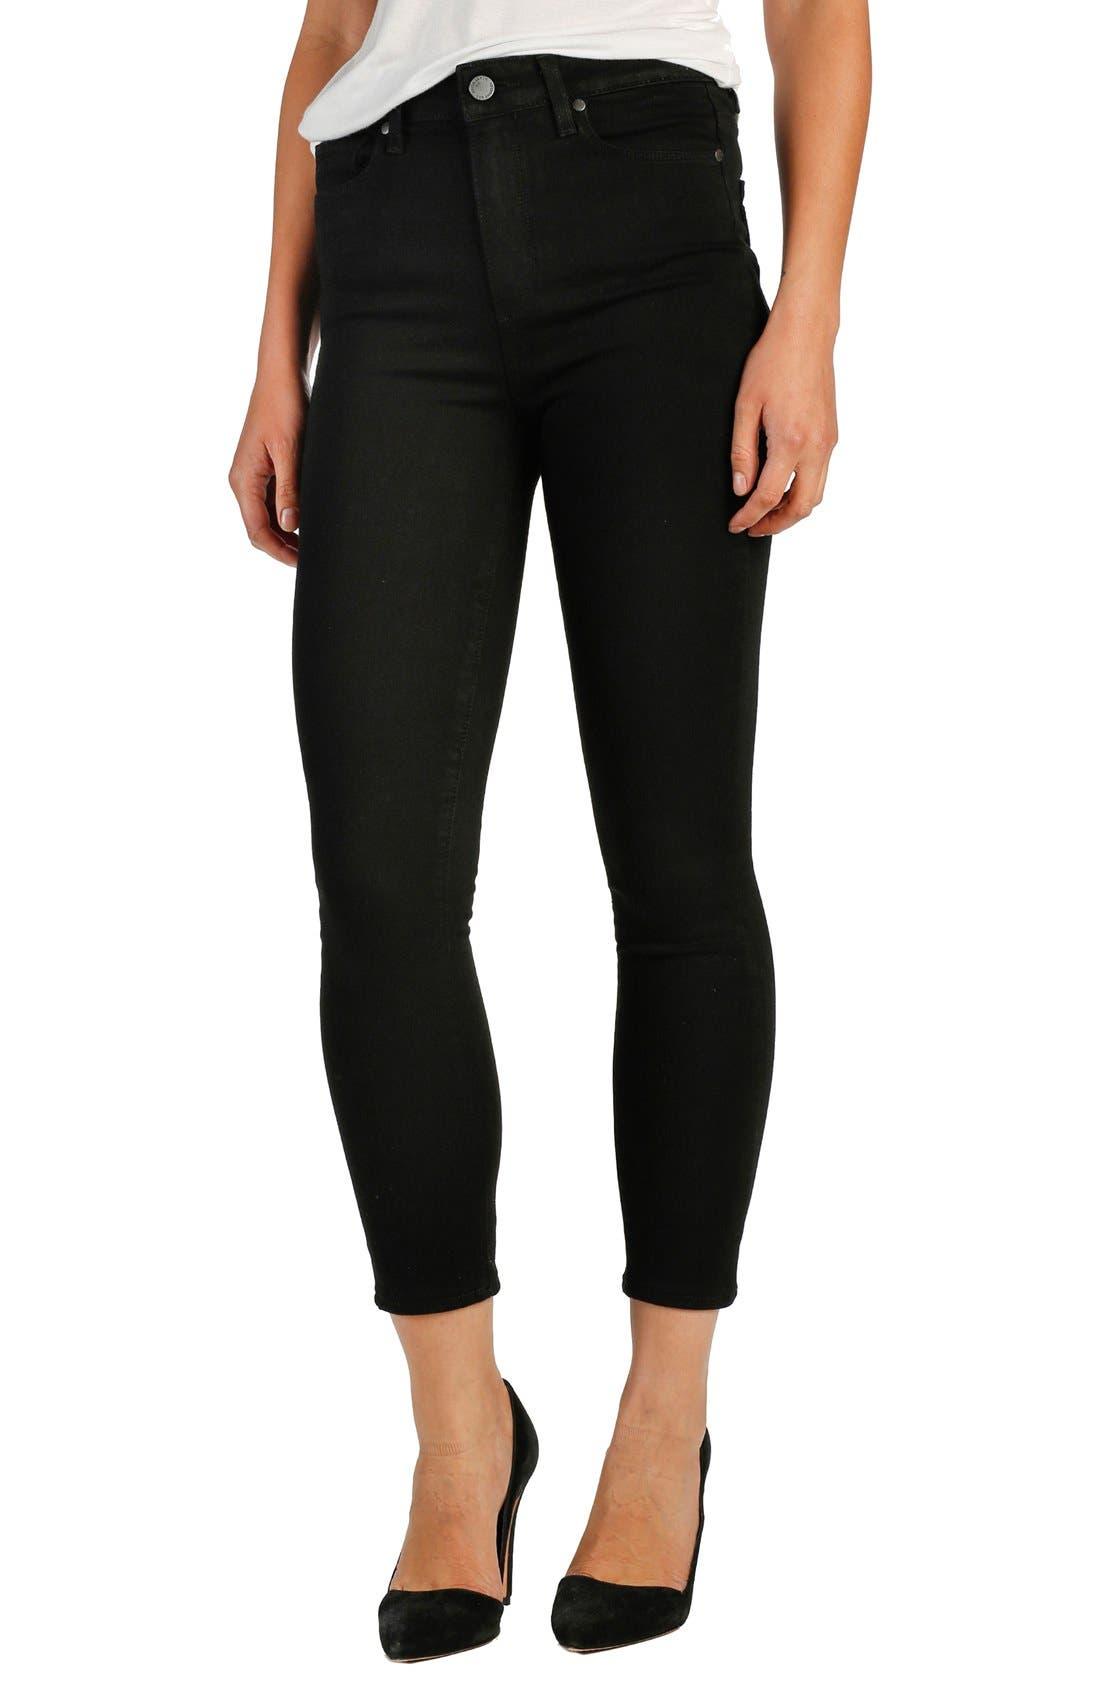 Transcend - Margot High Waist Crop Ultra Skinny Jeans,                         Main,                         color, Black Shadow